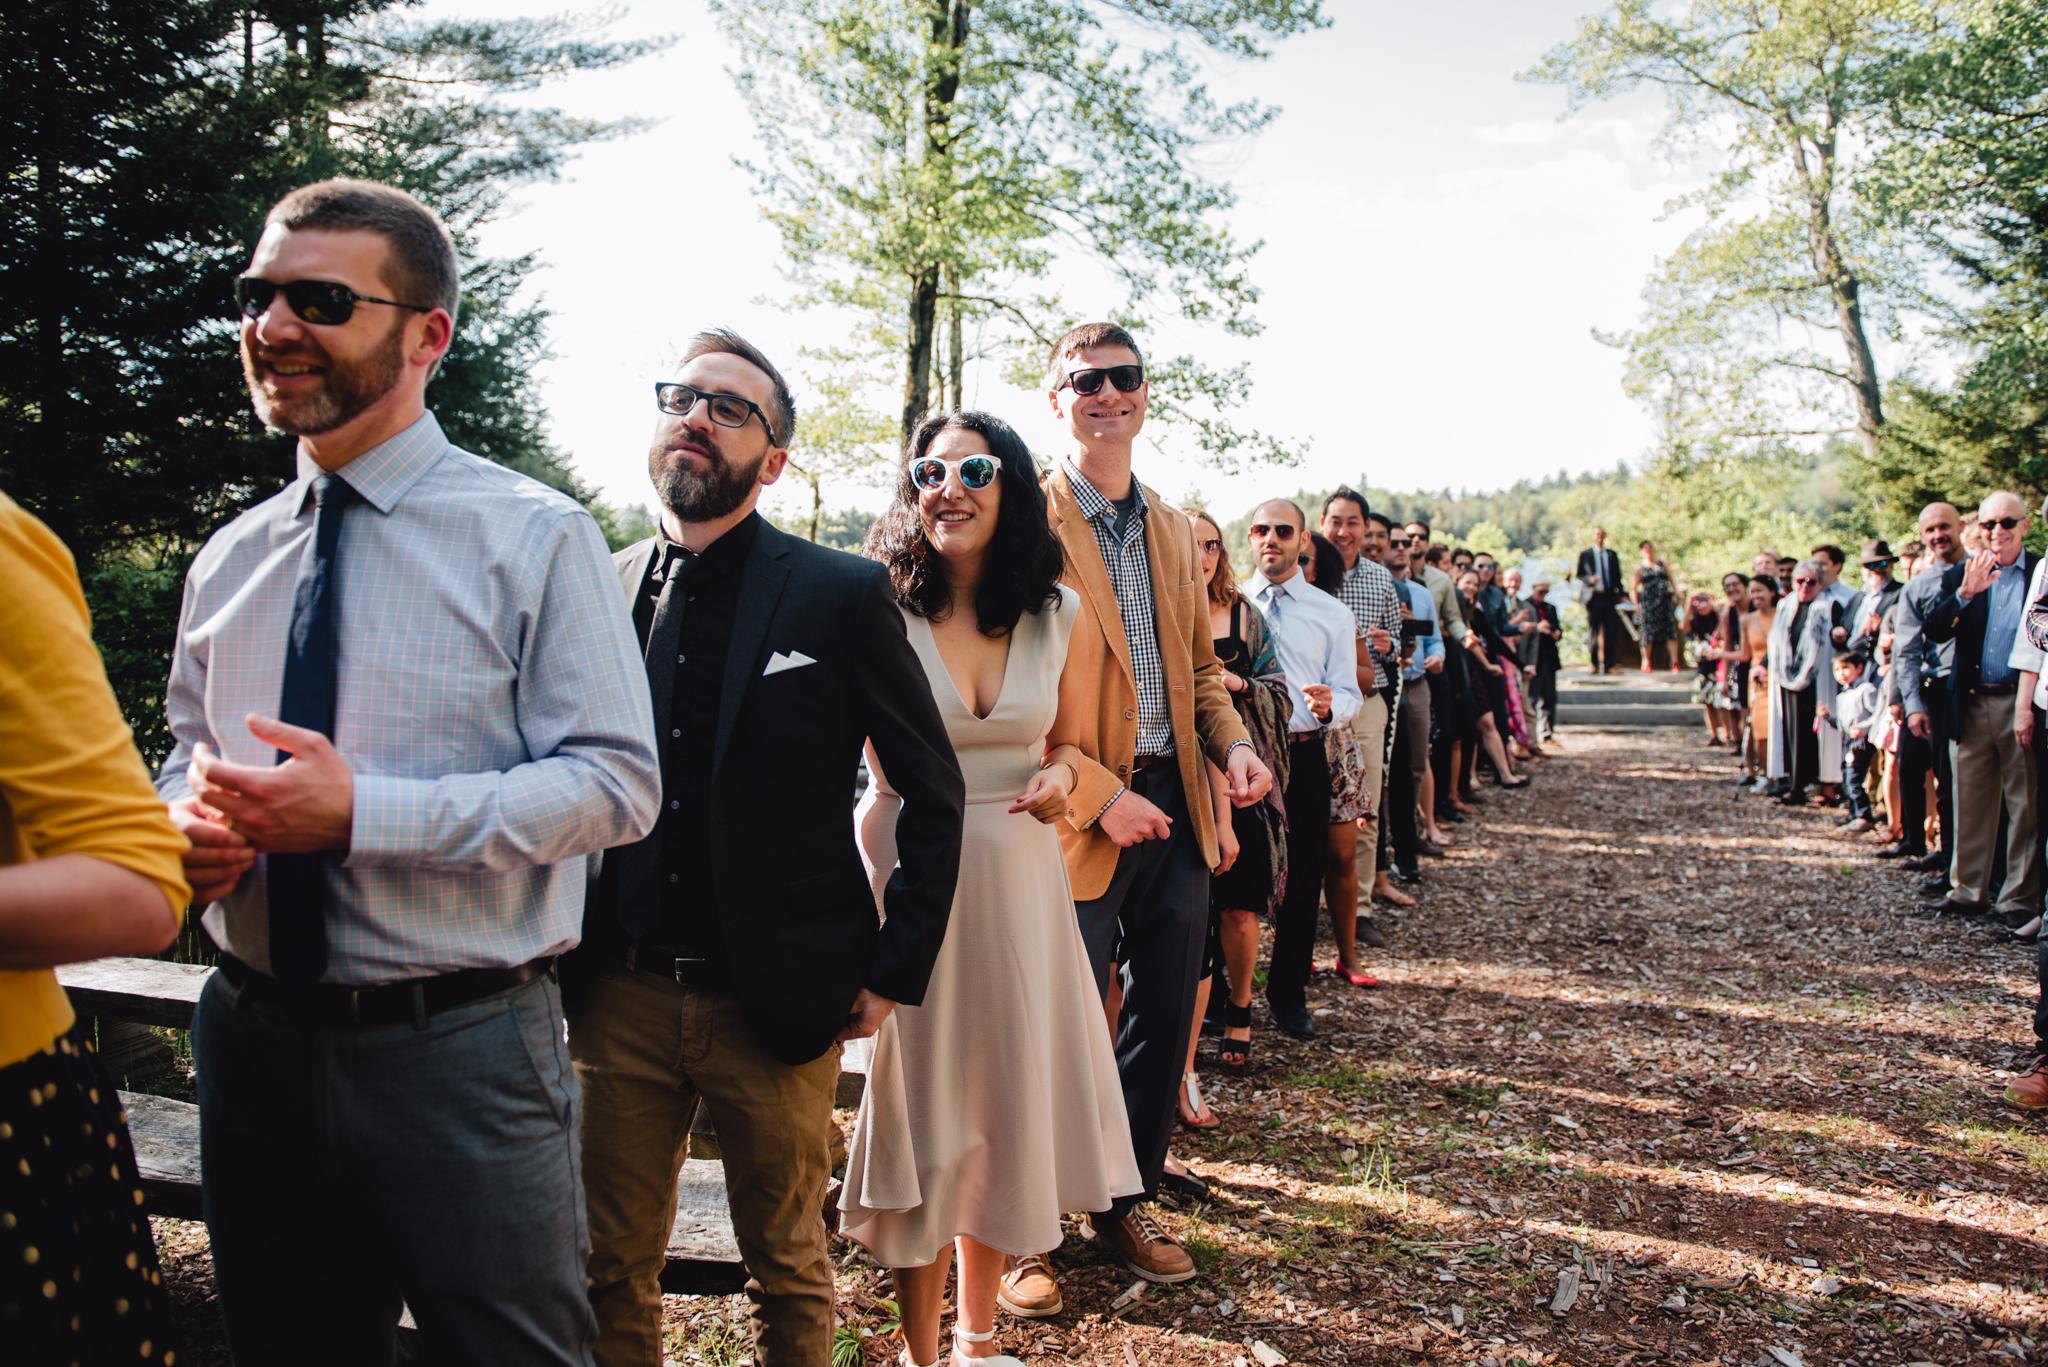 Summer Camp Wedding Photography June 2017 Massachusetts Berkshires Outdoor Wedding Photography Novella Photography Matt and Paulette Griswold (70).jpg